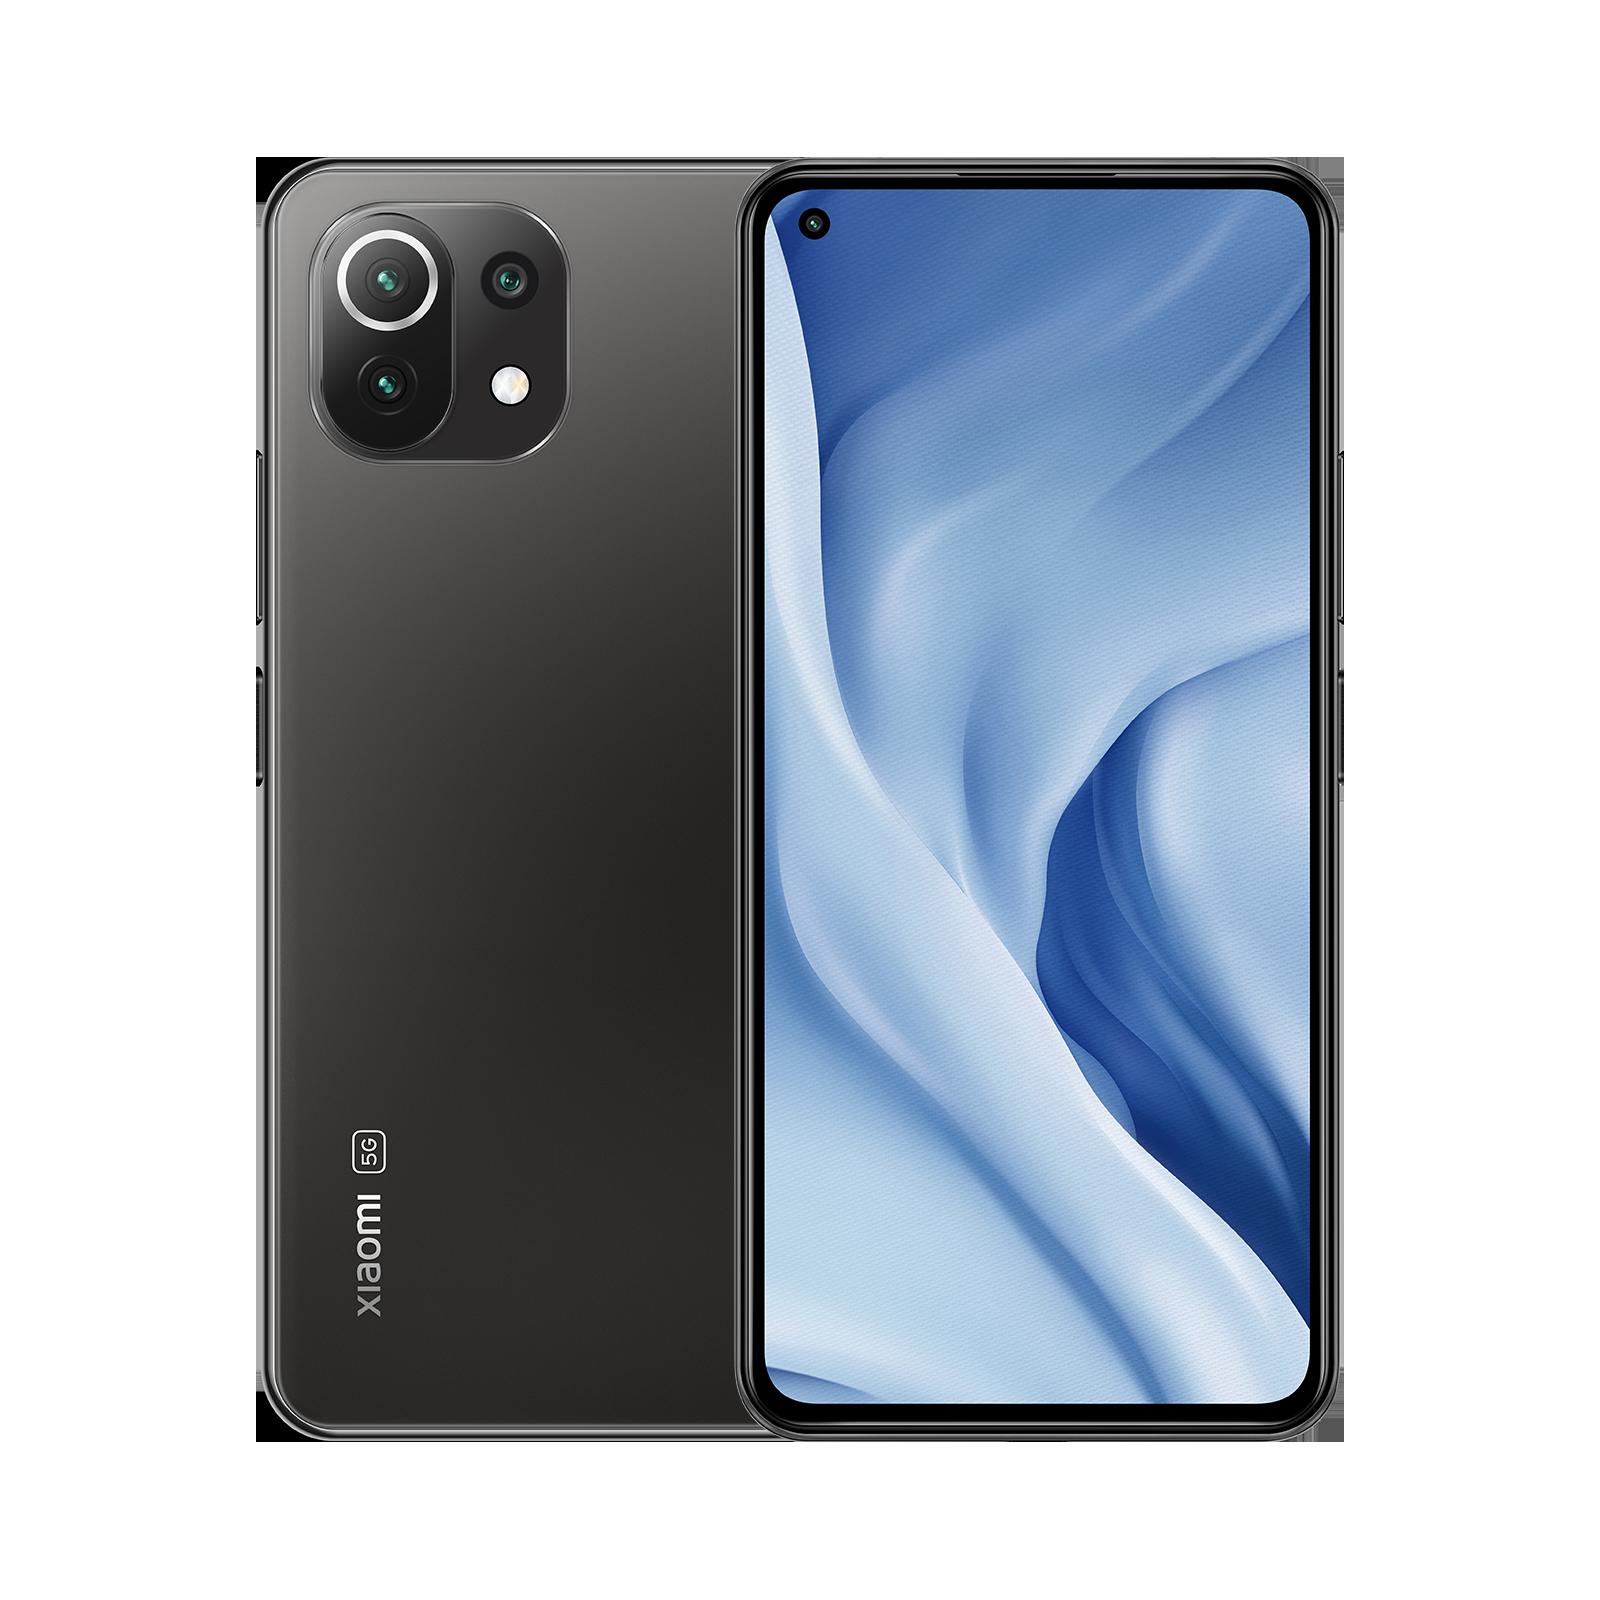 Mi 11 Lite 5G丨Xiaomi Deutschland丨Mi.com